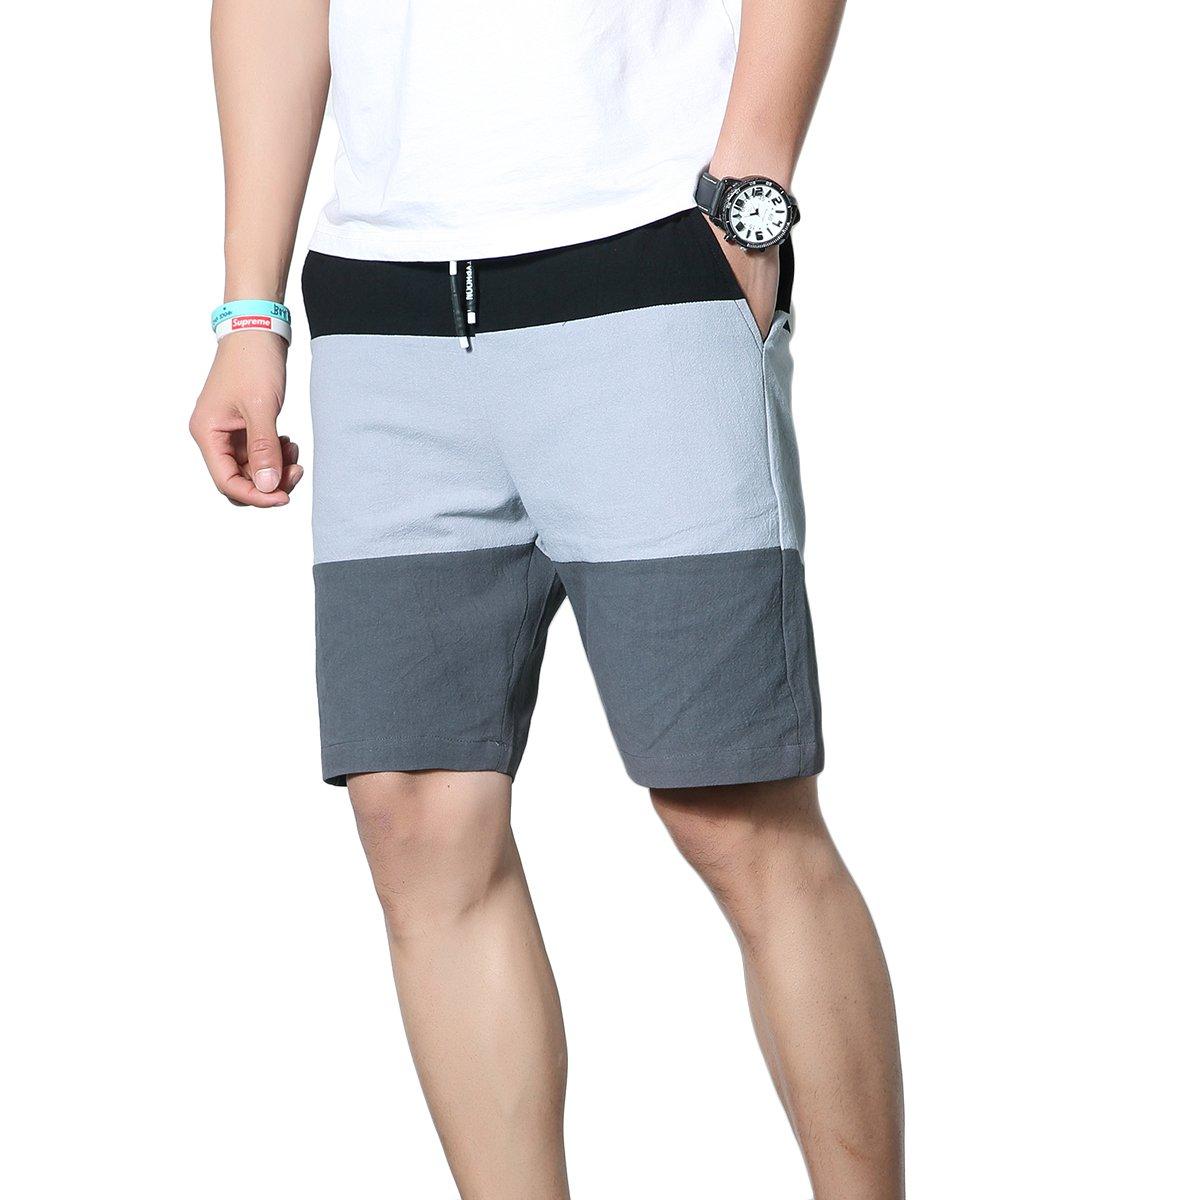 K&S Men's Linen Casual Classic Fit Drawstring Summer Beach Shorts (M, Z22-Gray)